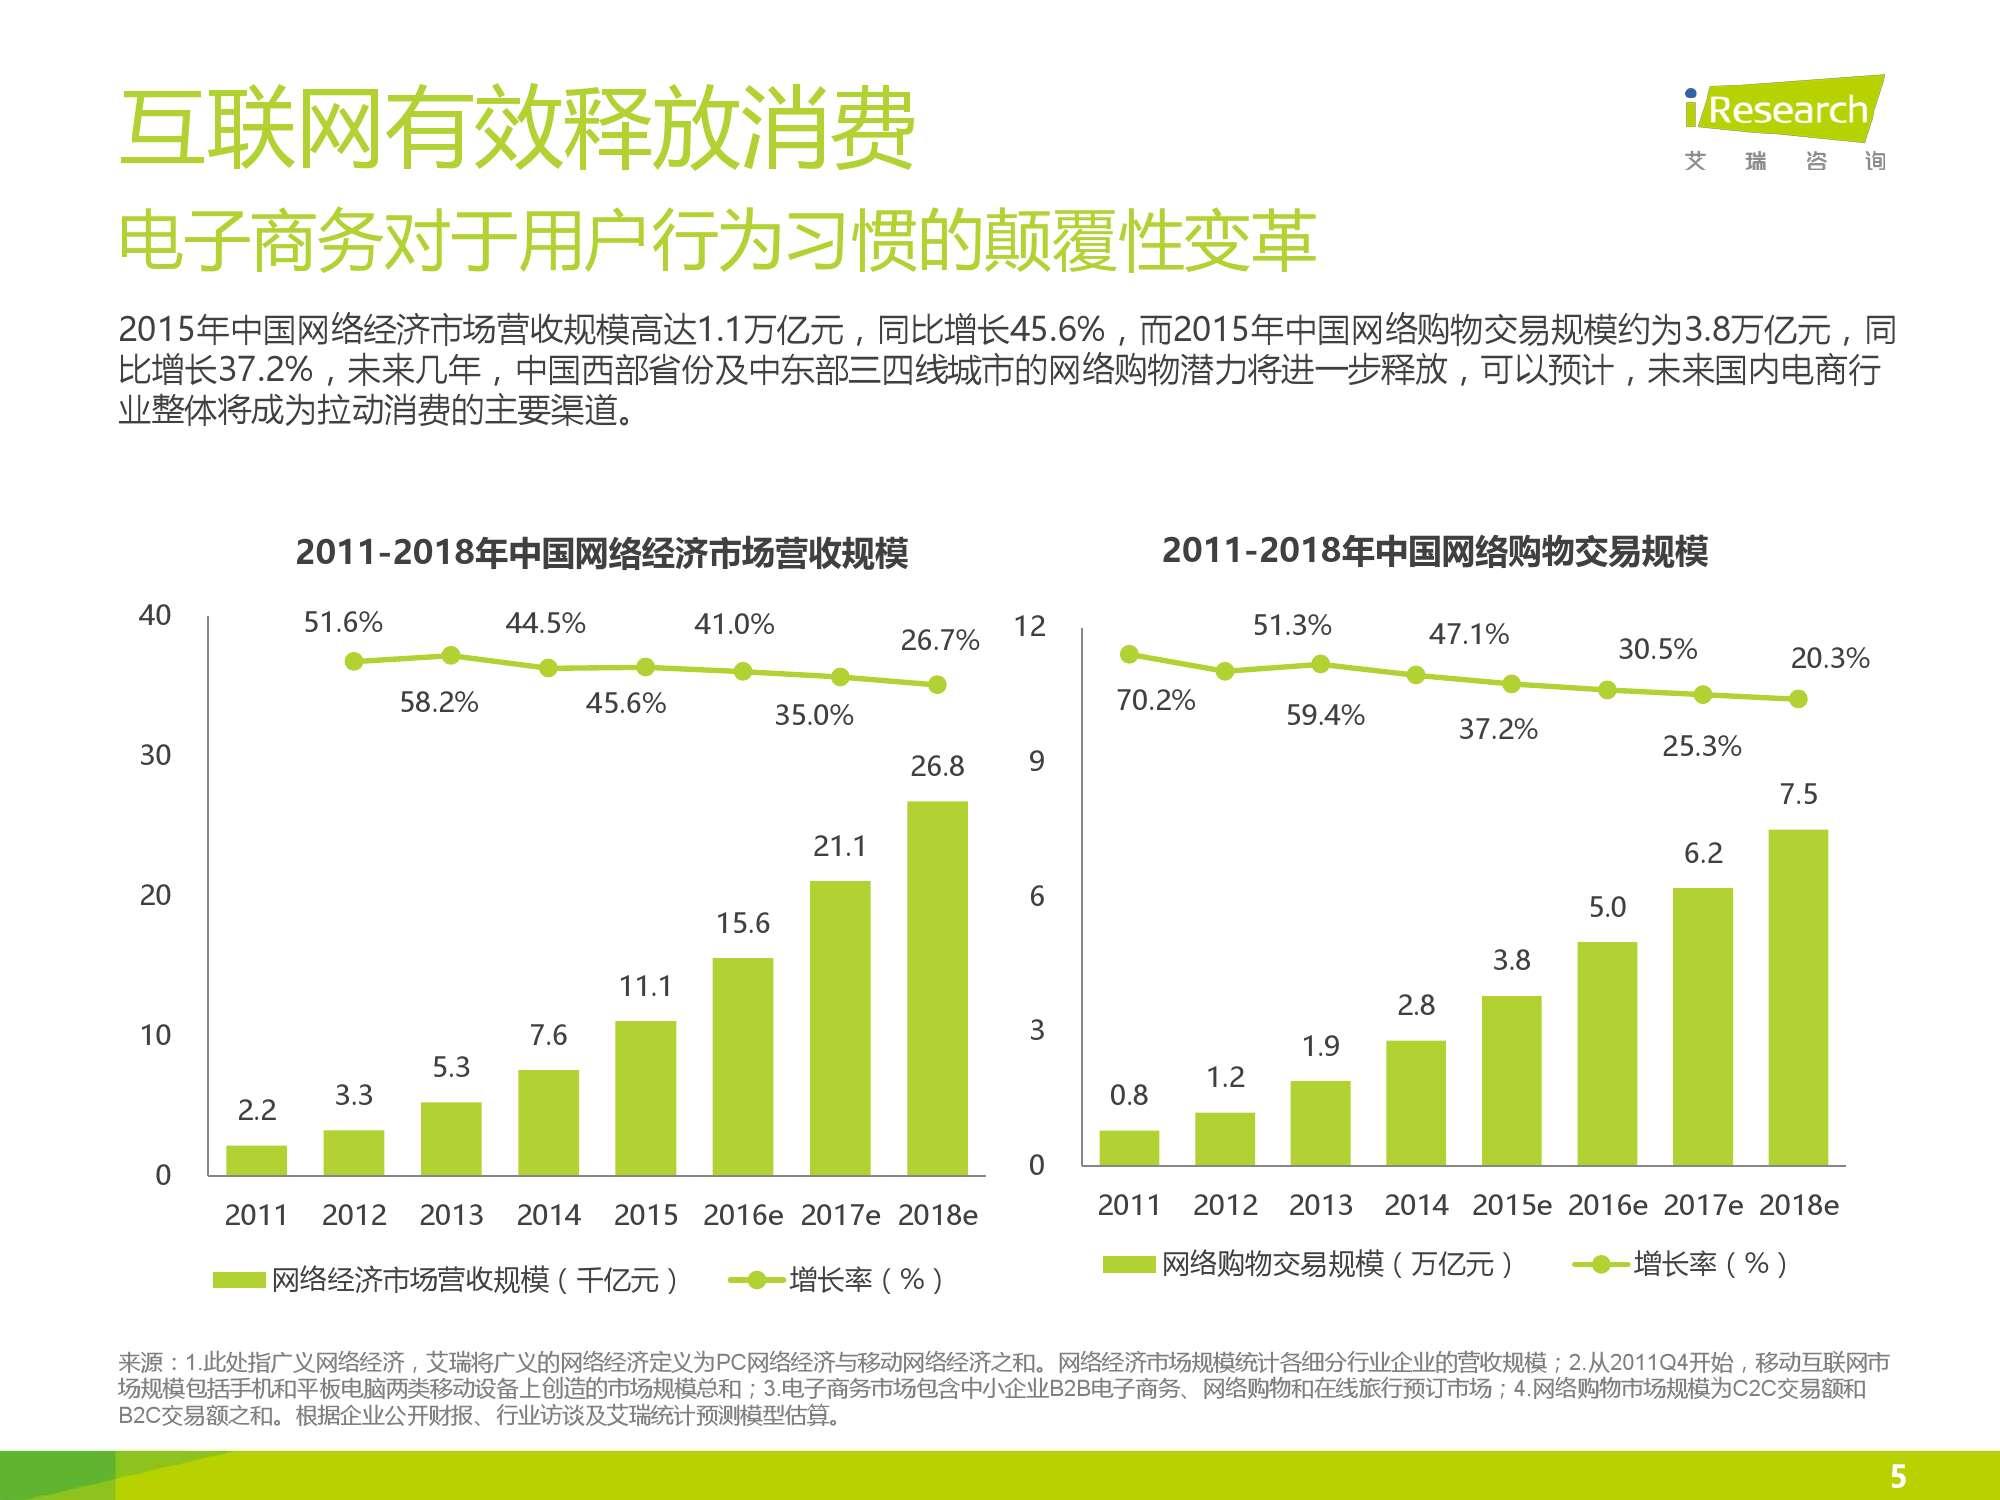 iResearch-2016年中国互联网消费金融市场研究报告_000005